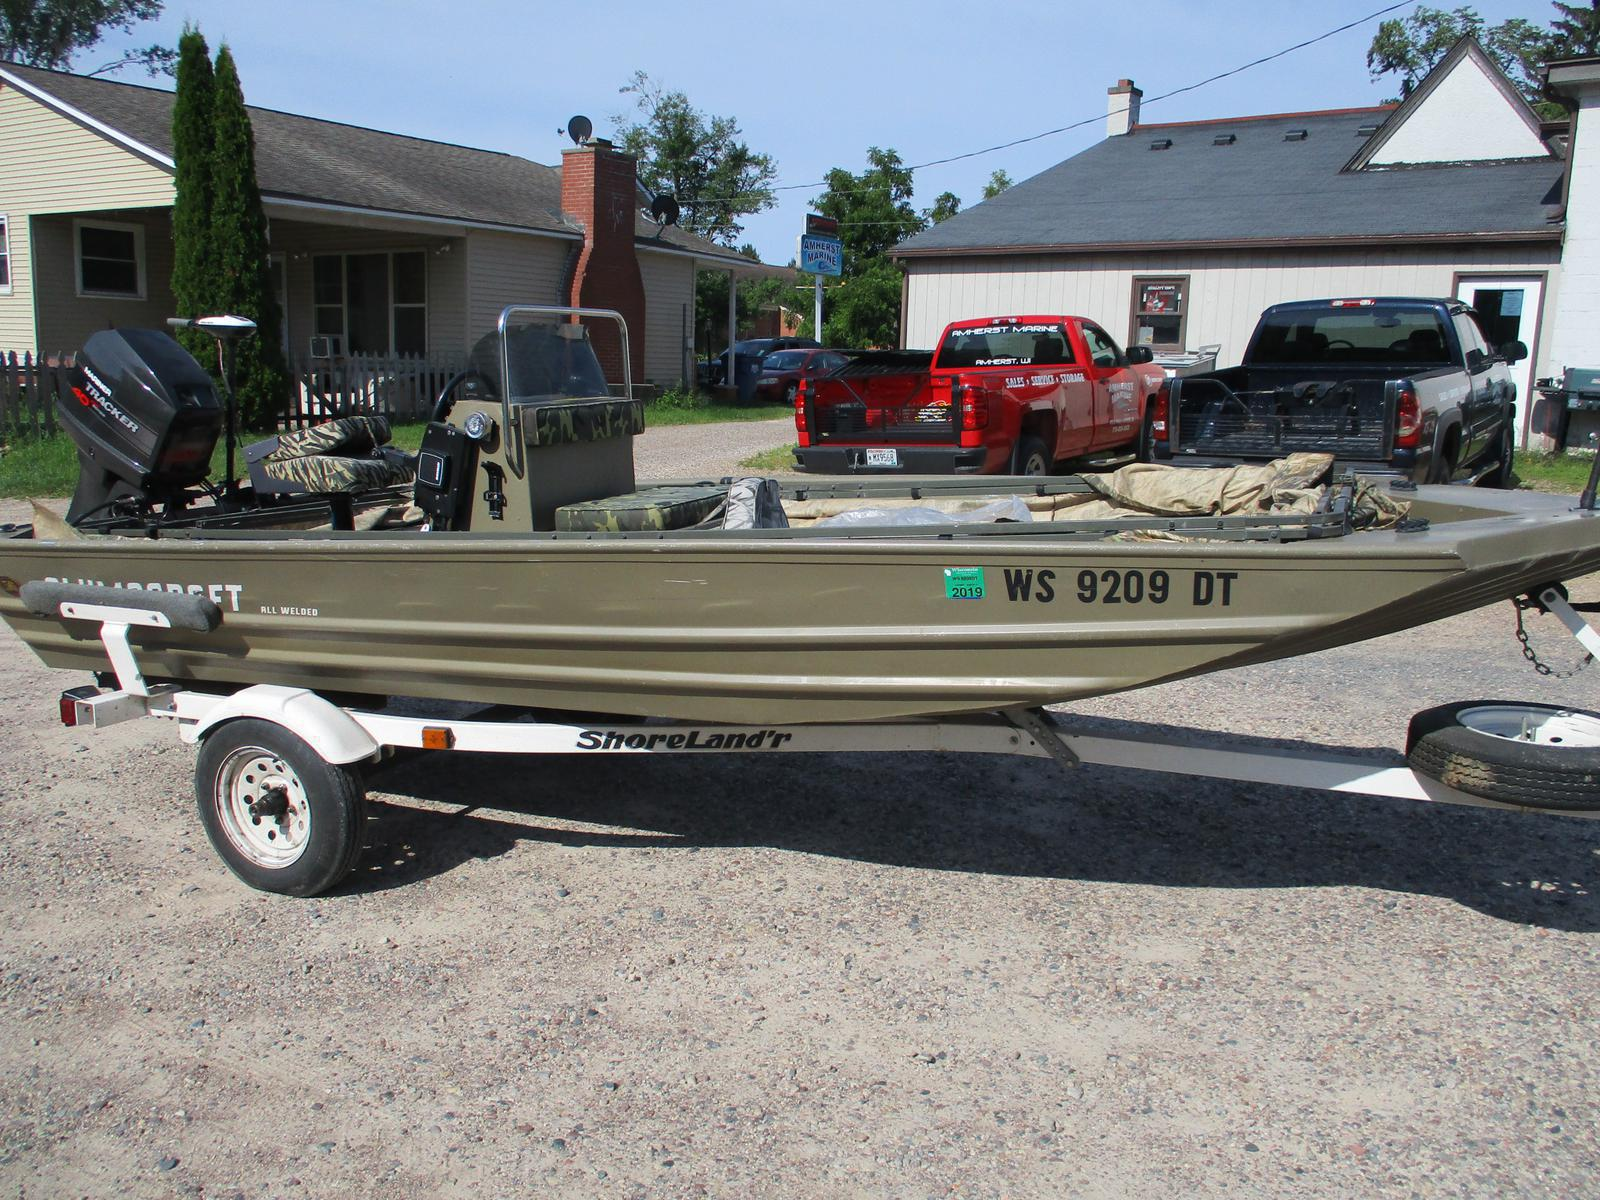 Used Inventory Amherst Marine Amherst, WI (715) 824-5635